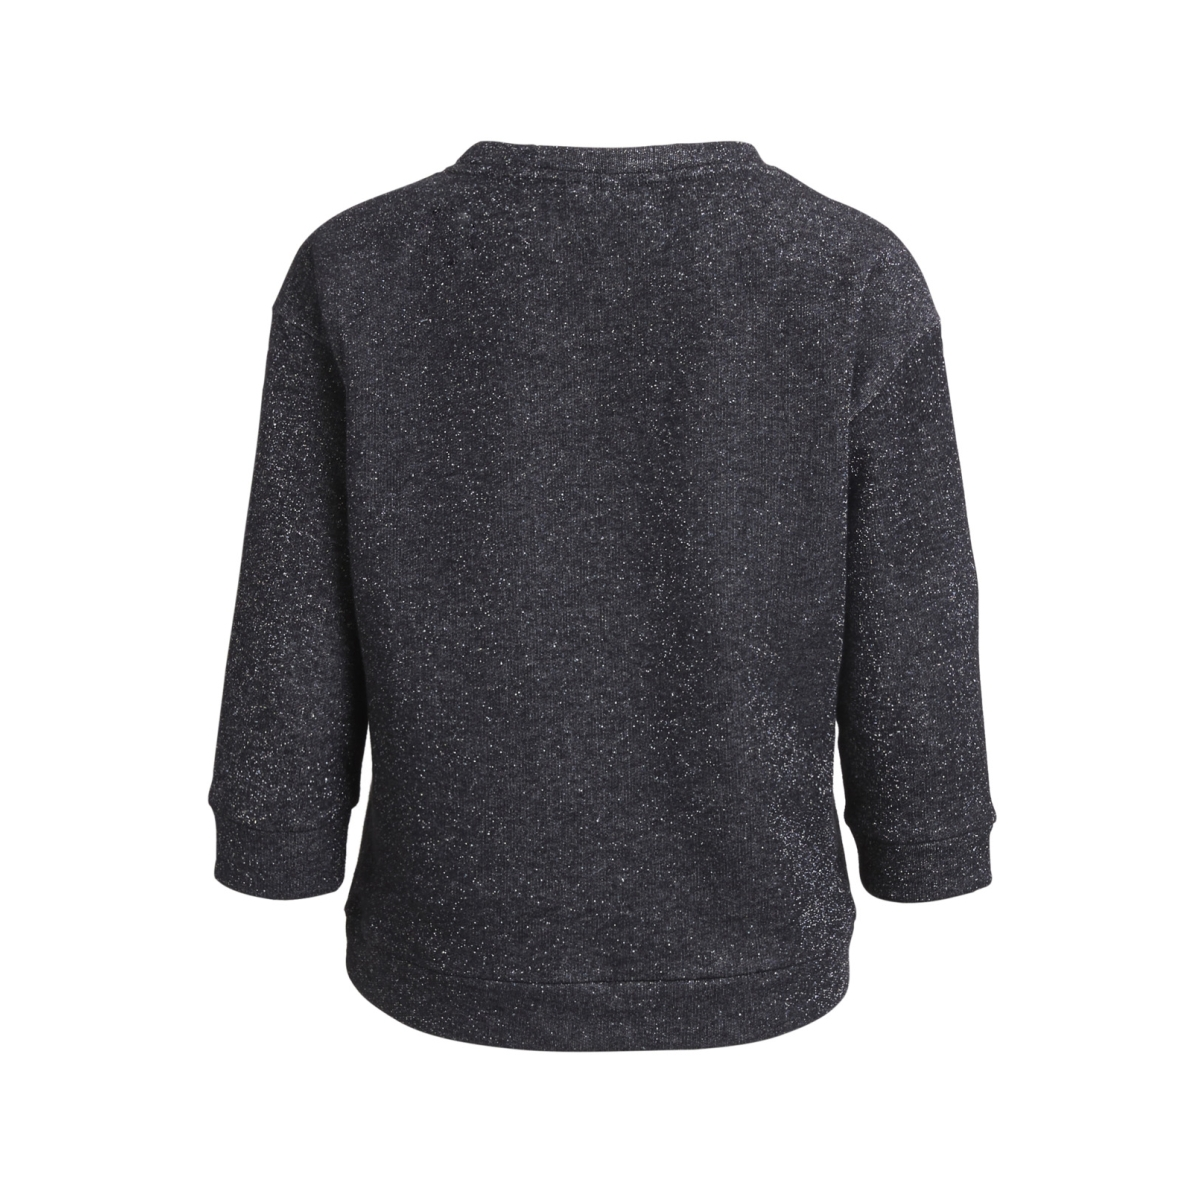 objglitter 3/4 pullover apb 23026445 object sweater black